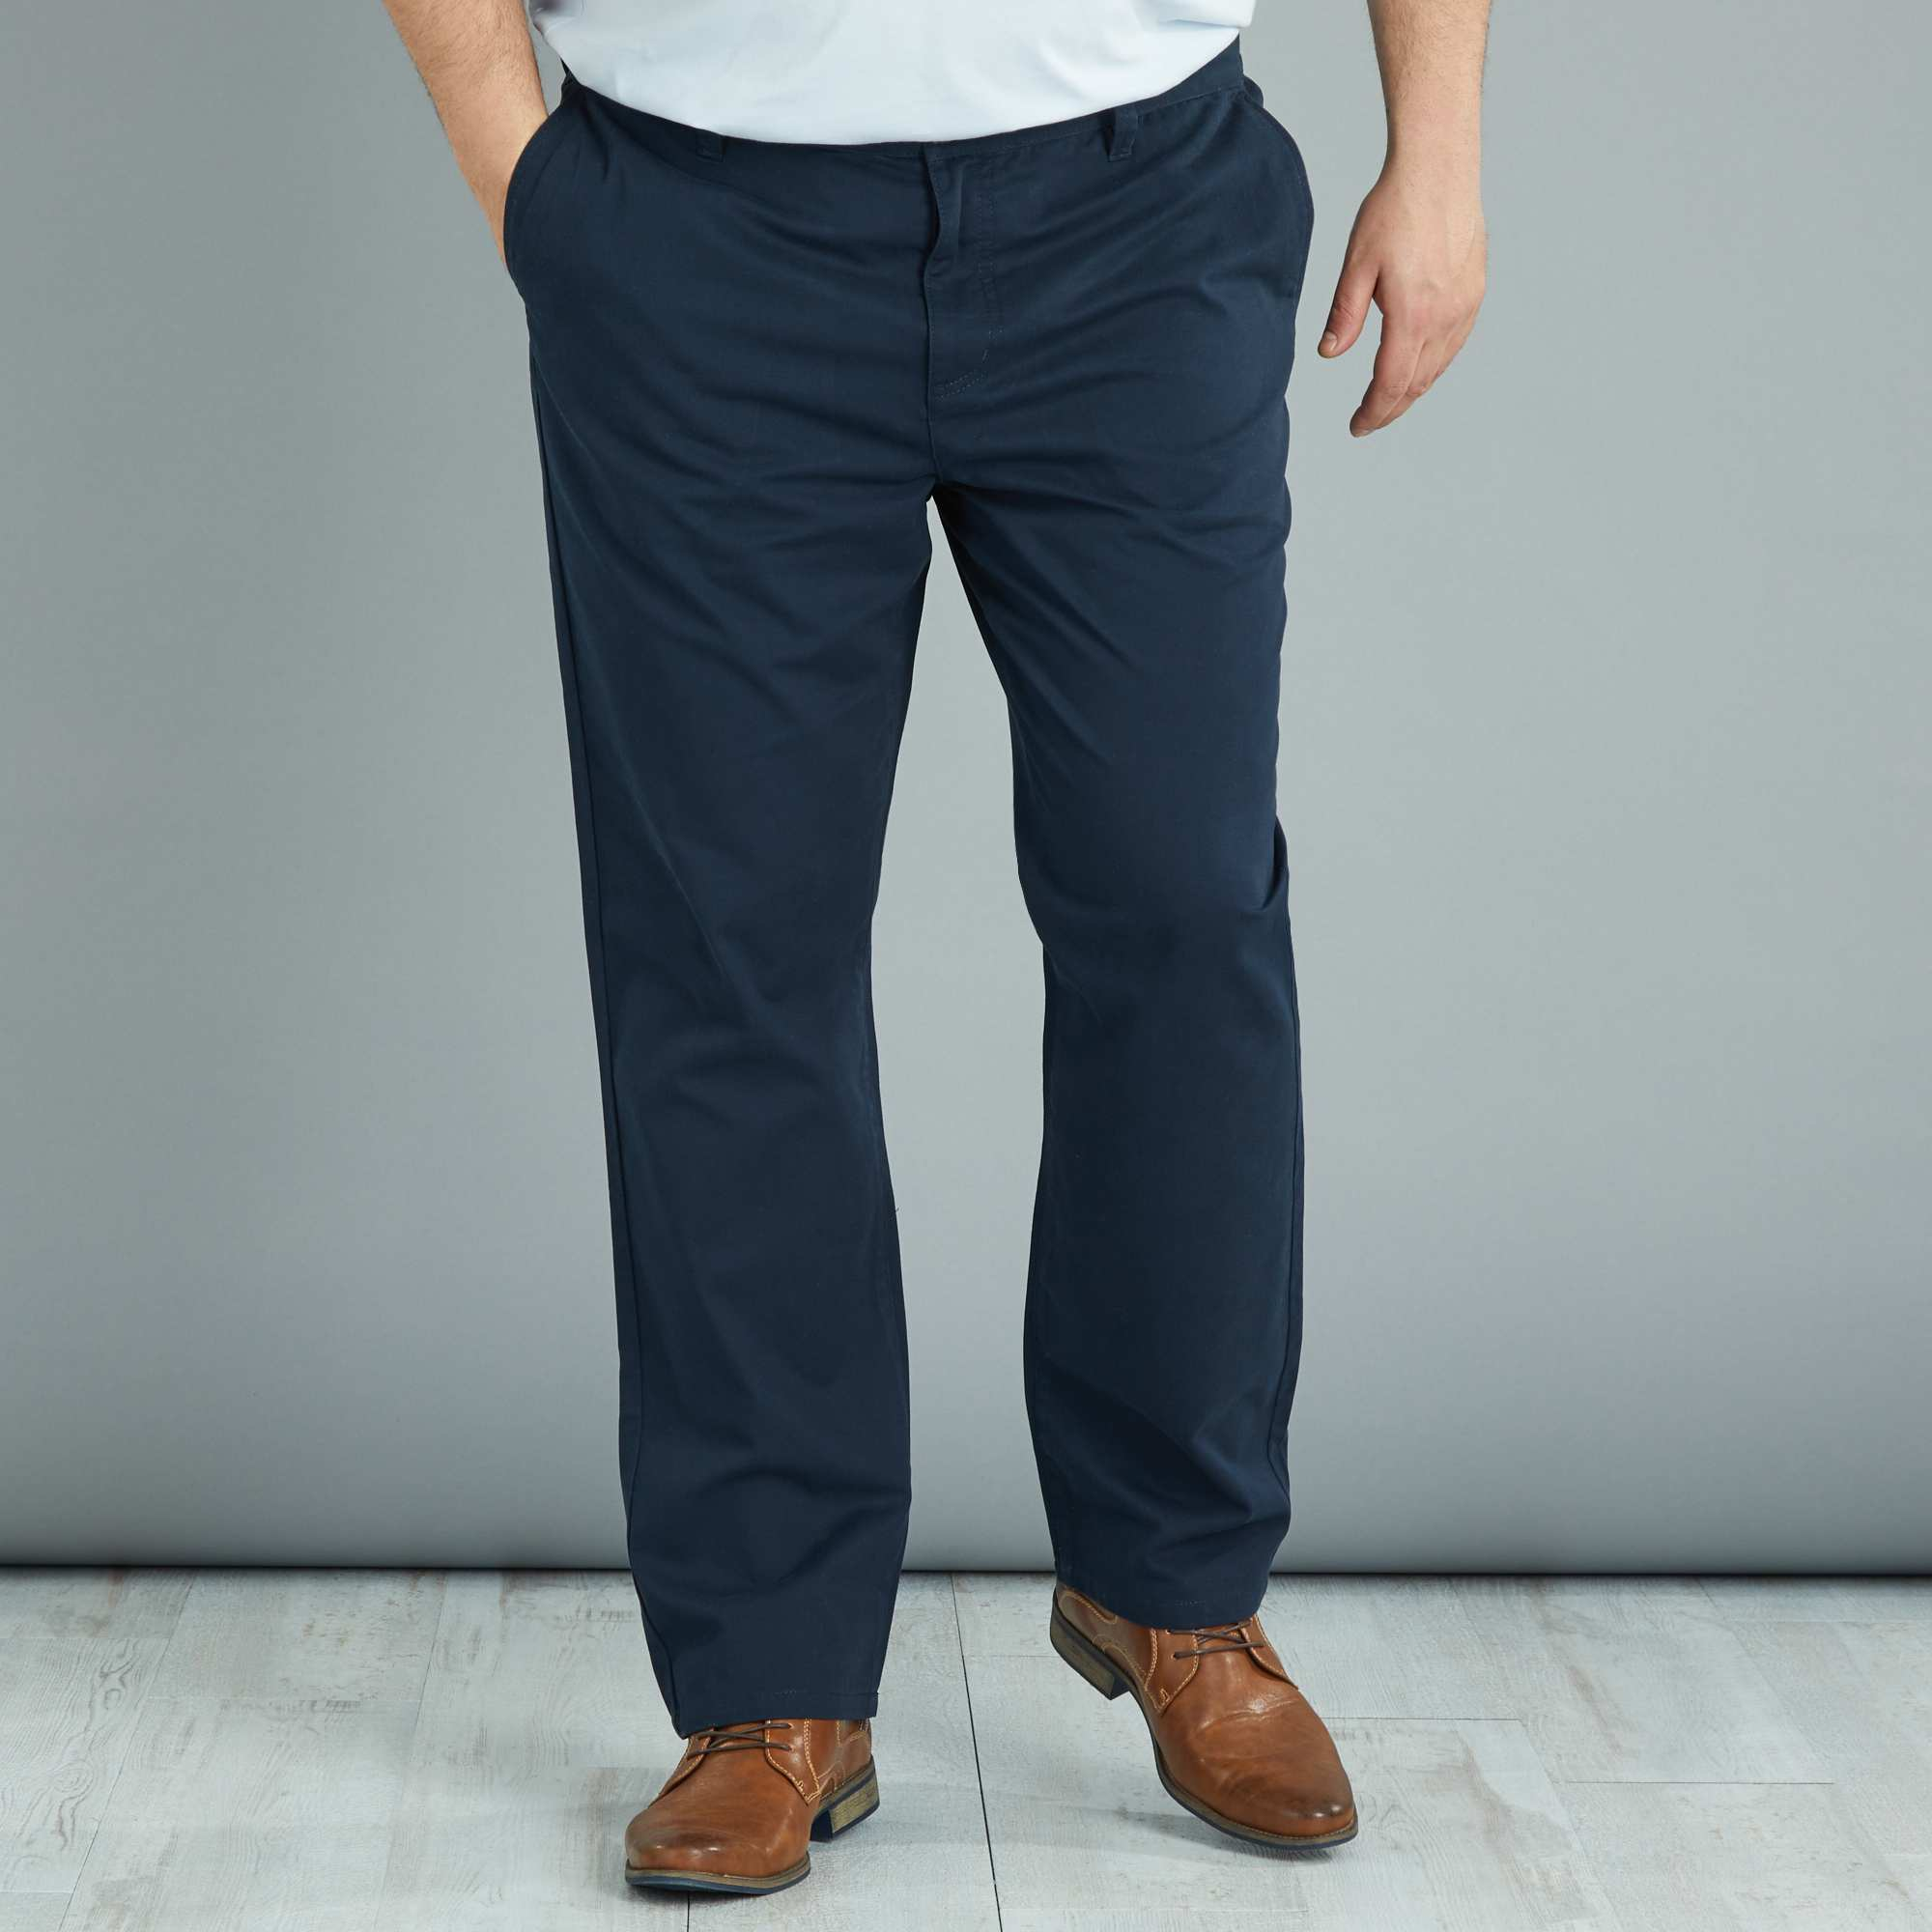 pantalon chino regular en twill grande taille homme bleu marine kiabi 22 00. Black Bedroom Furniture Sets. Home Design Ideas